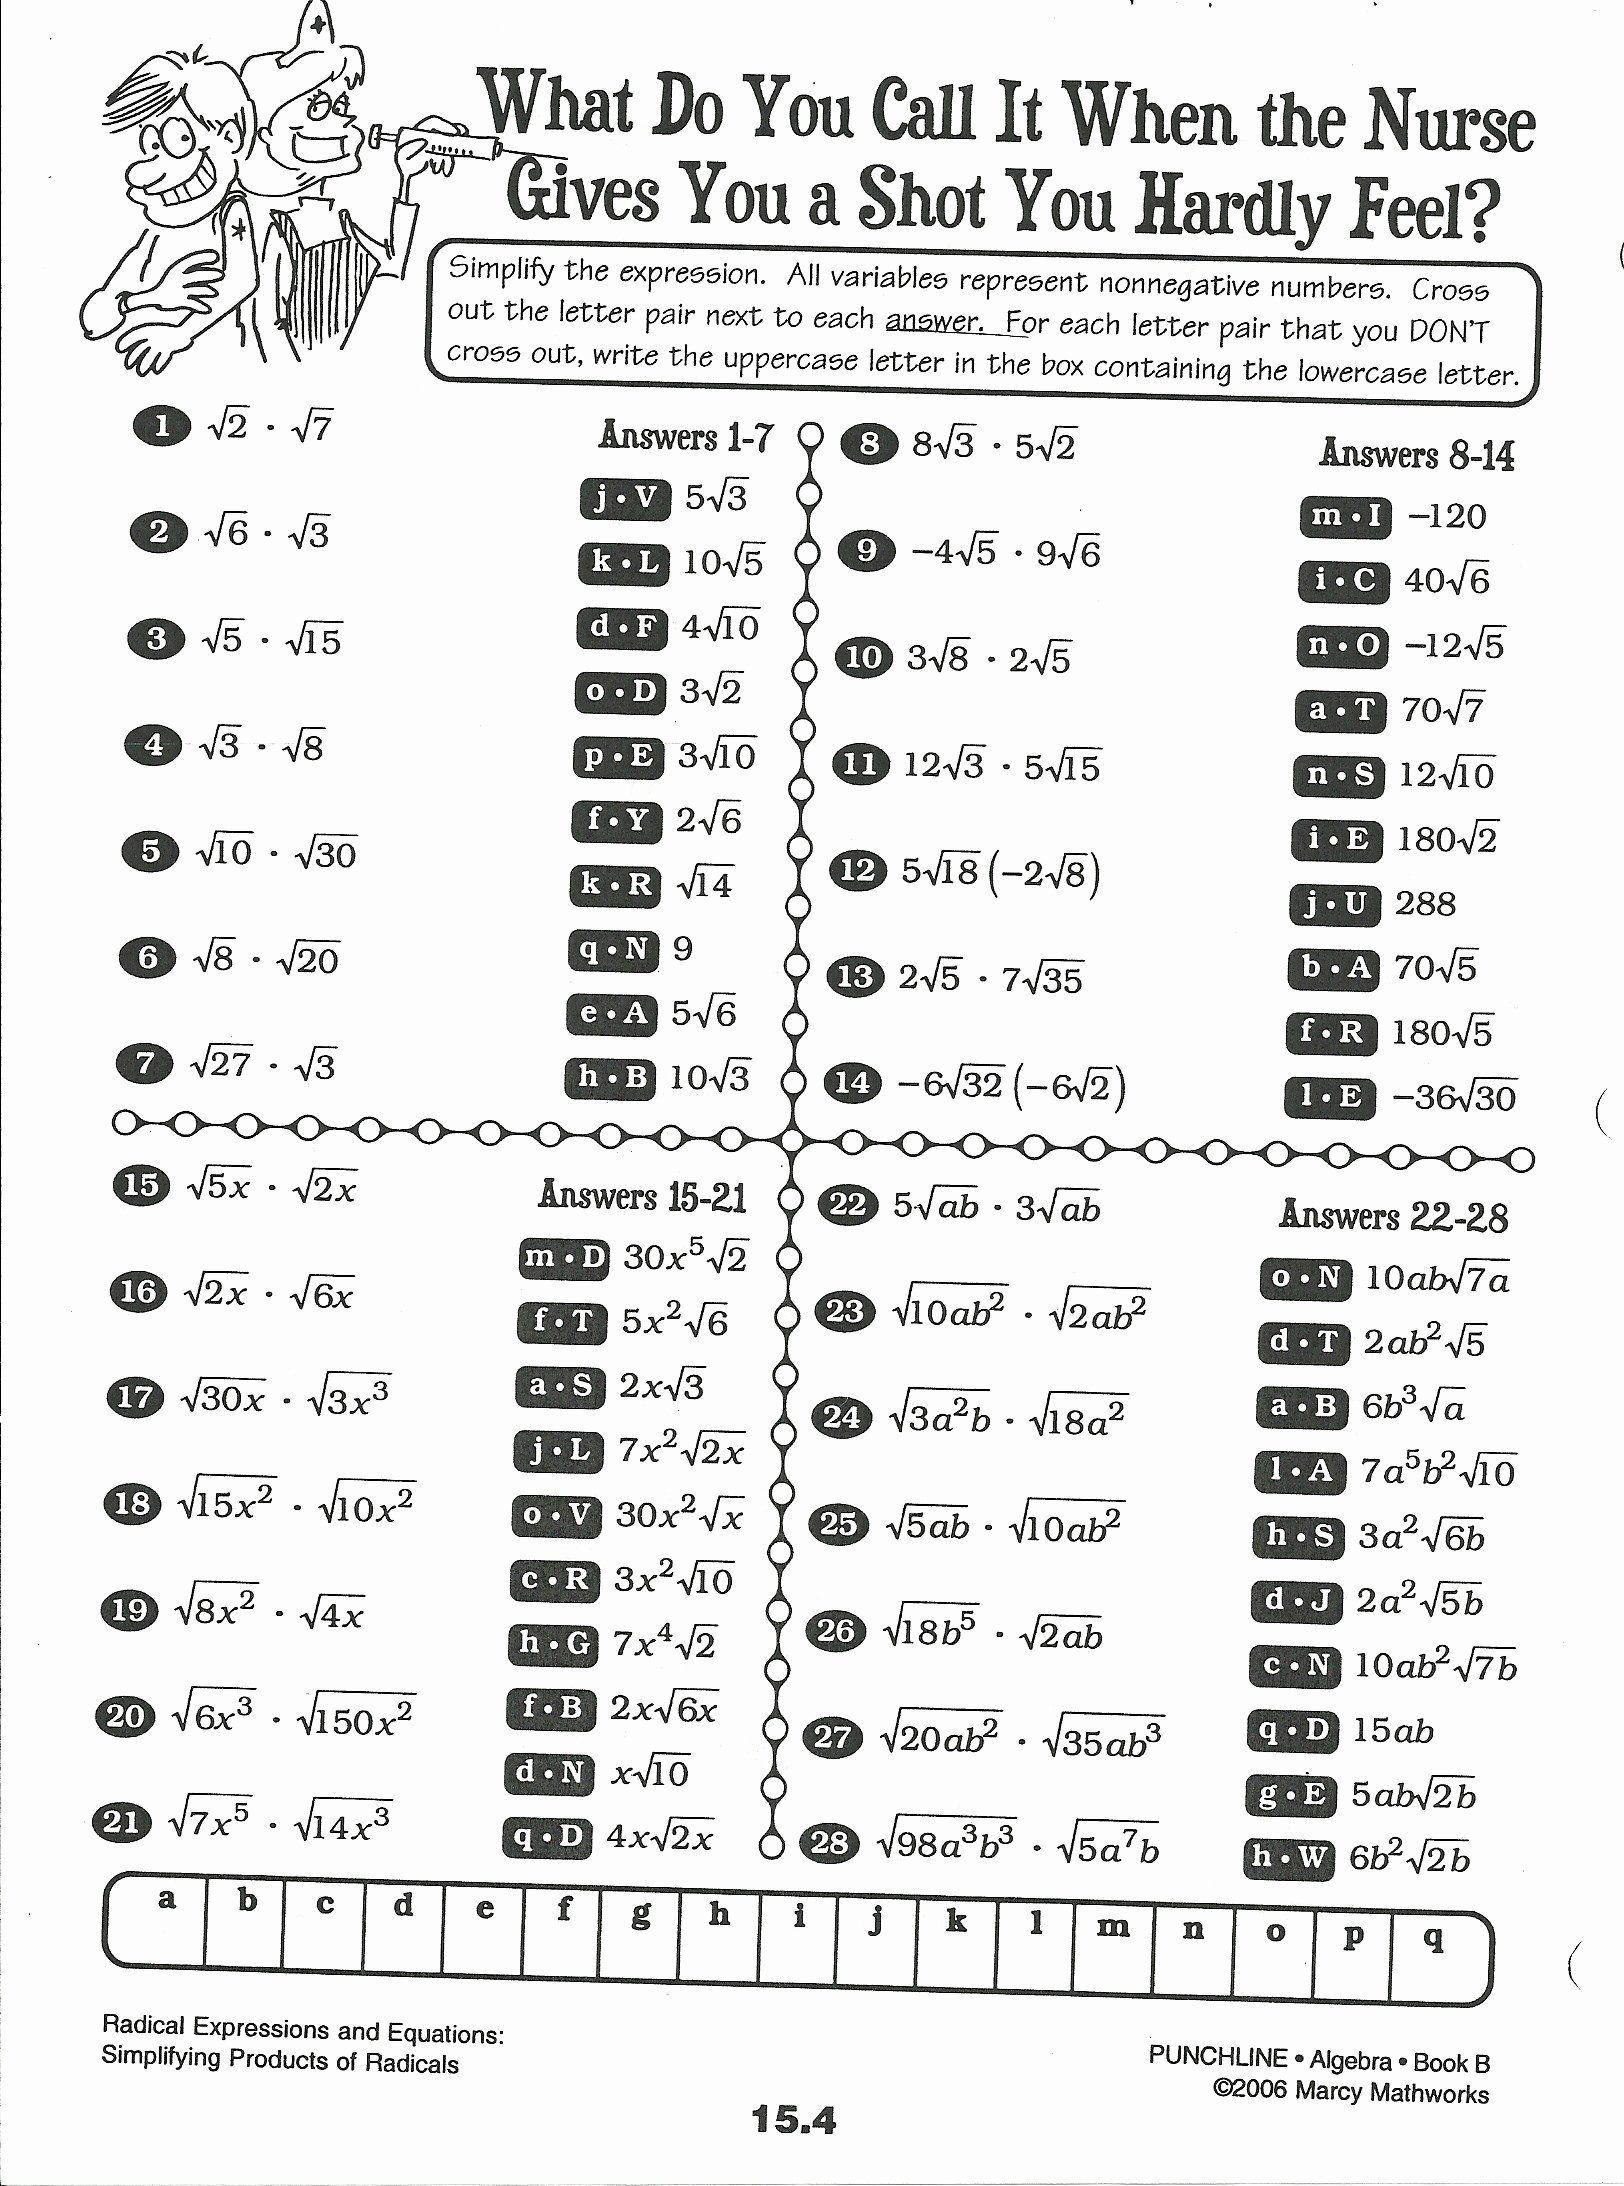 Simplifying Radicals Practice Worksheet Elegant Simplifying Rational Radicals Workshe In 2020 Simplifying Radicals Practices Worksheets Simplifying Radical Expressions